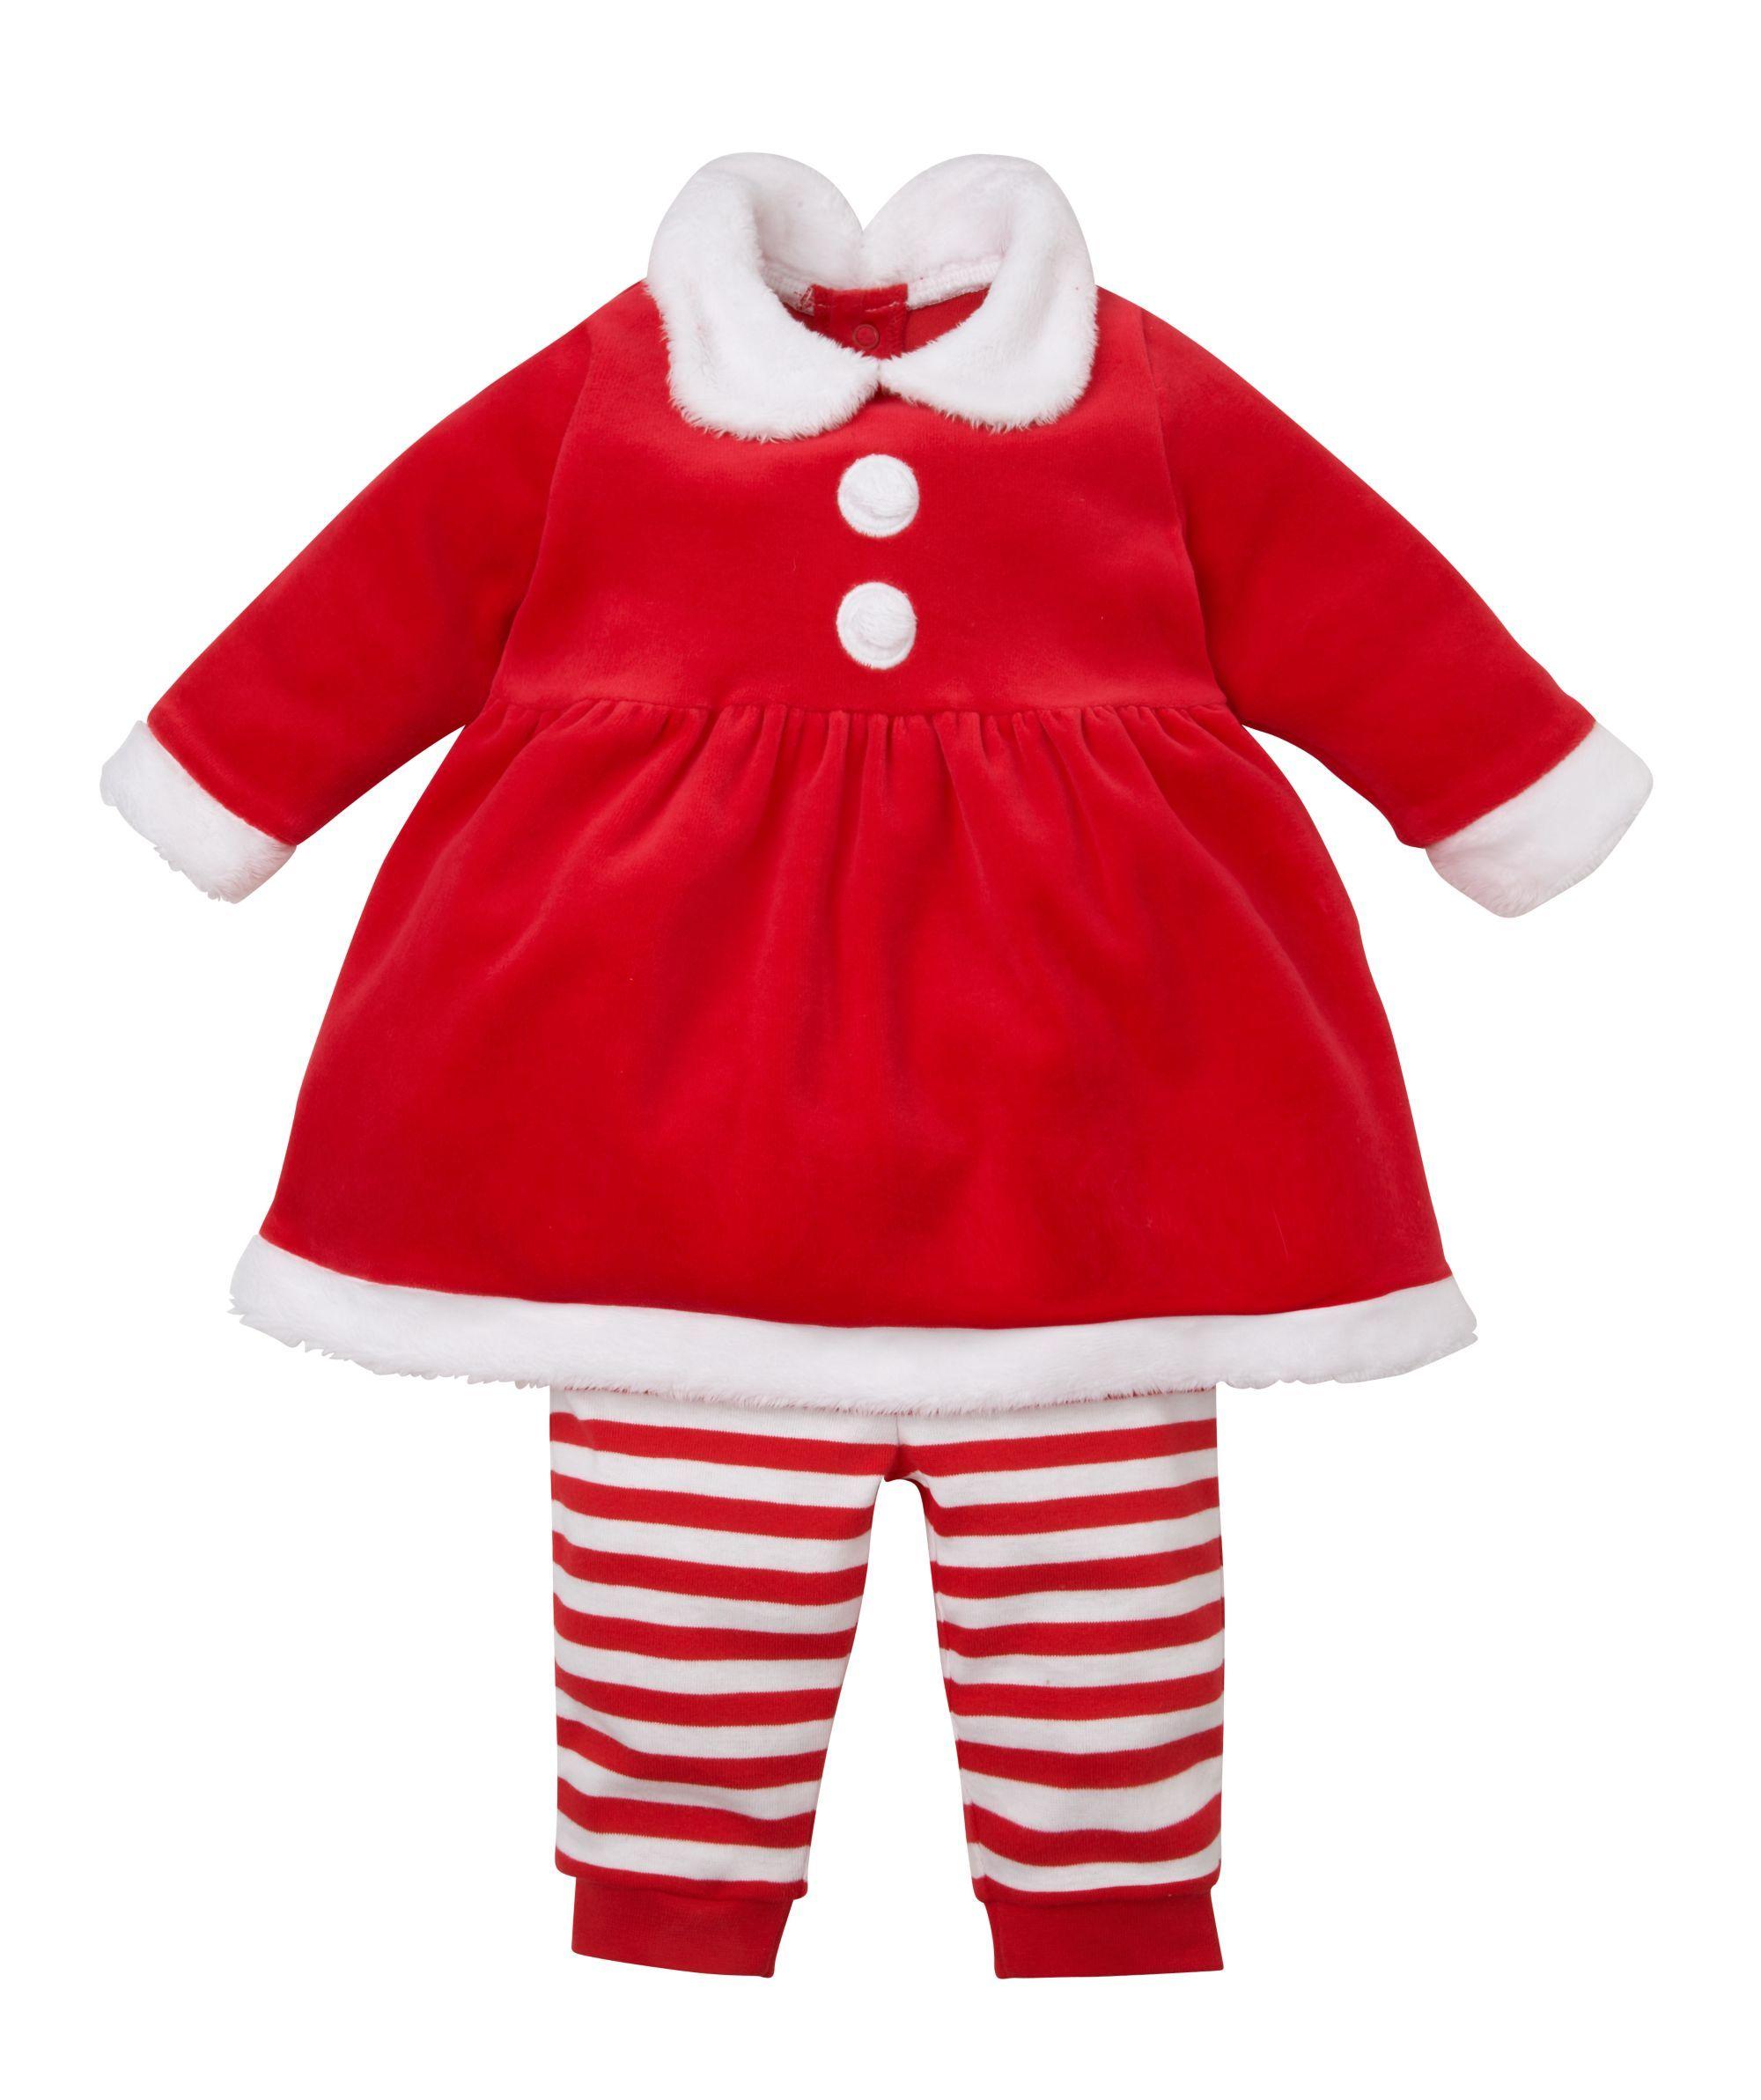 Mrs Santa Dress Up Leggings and Dress